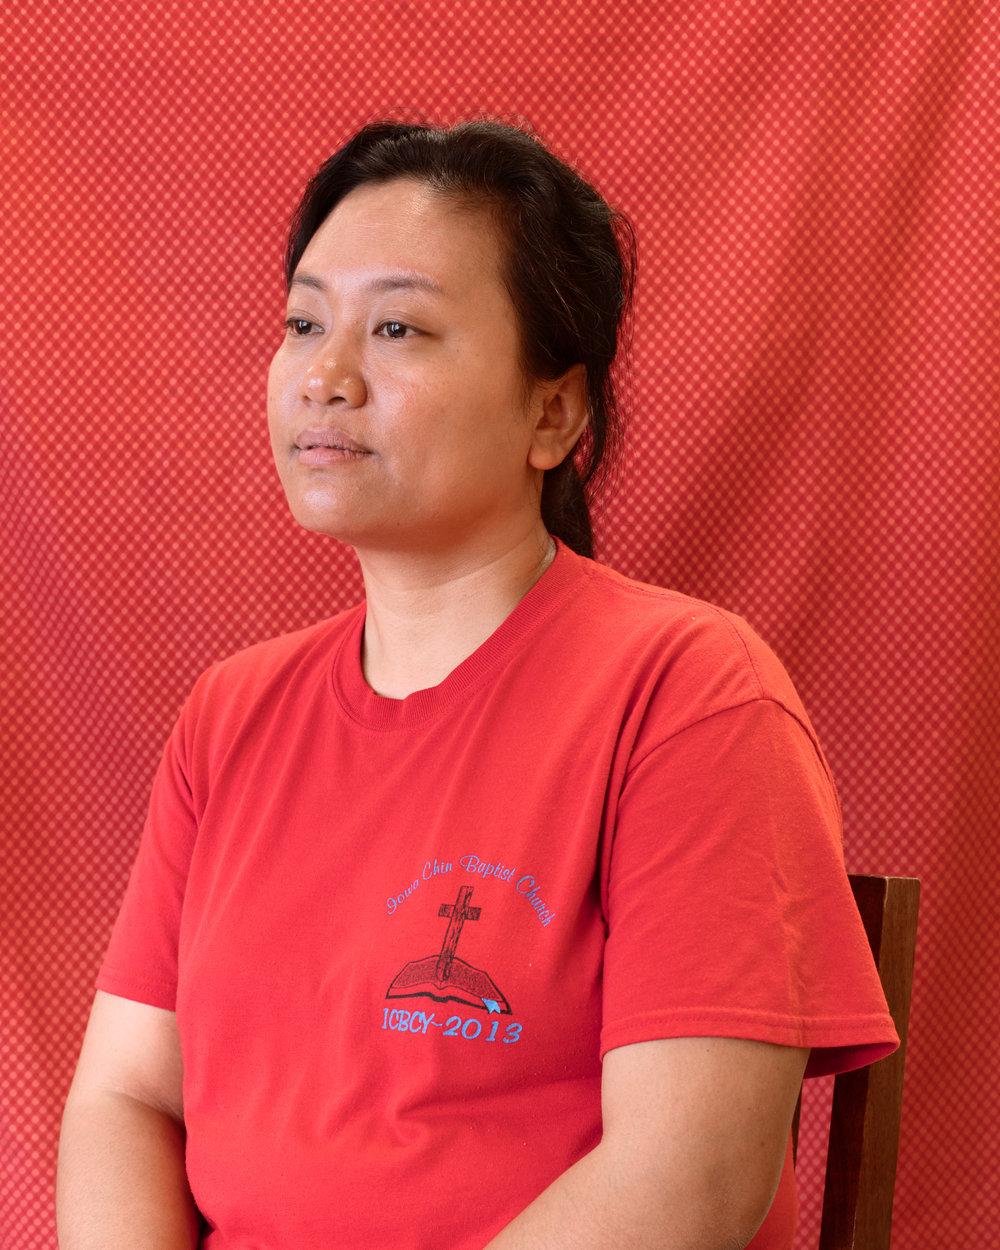 zo-chin-restaurant-3F2A8471.jpg